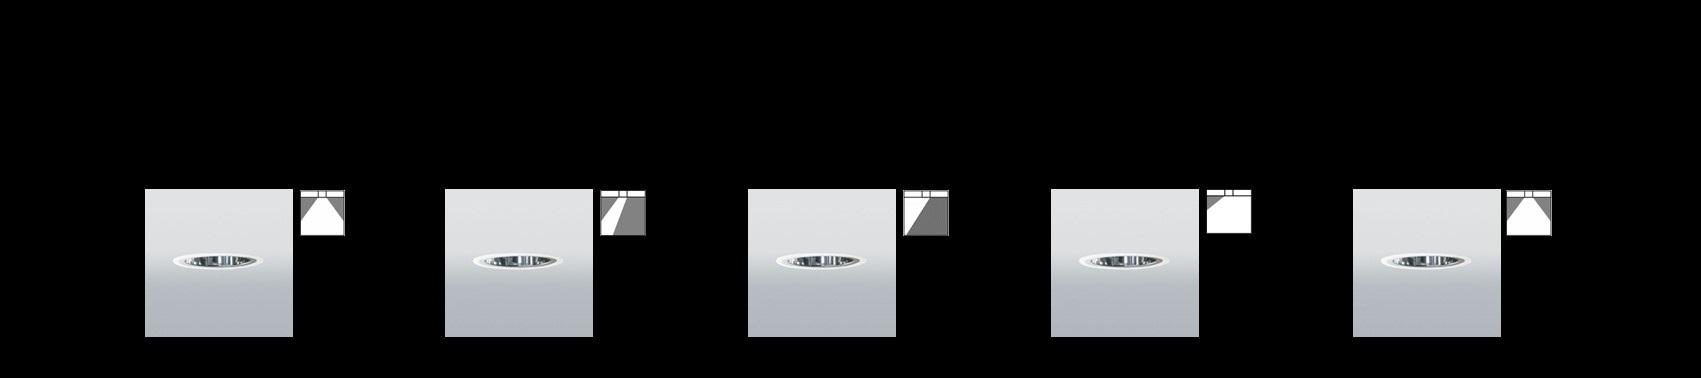 28.afb-header-lucent-lighting-downlighter-140-zwart-website